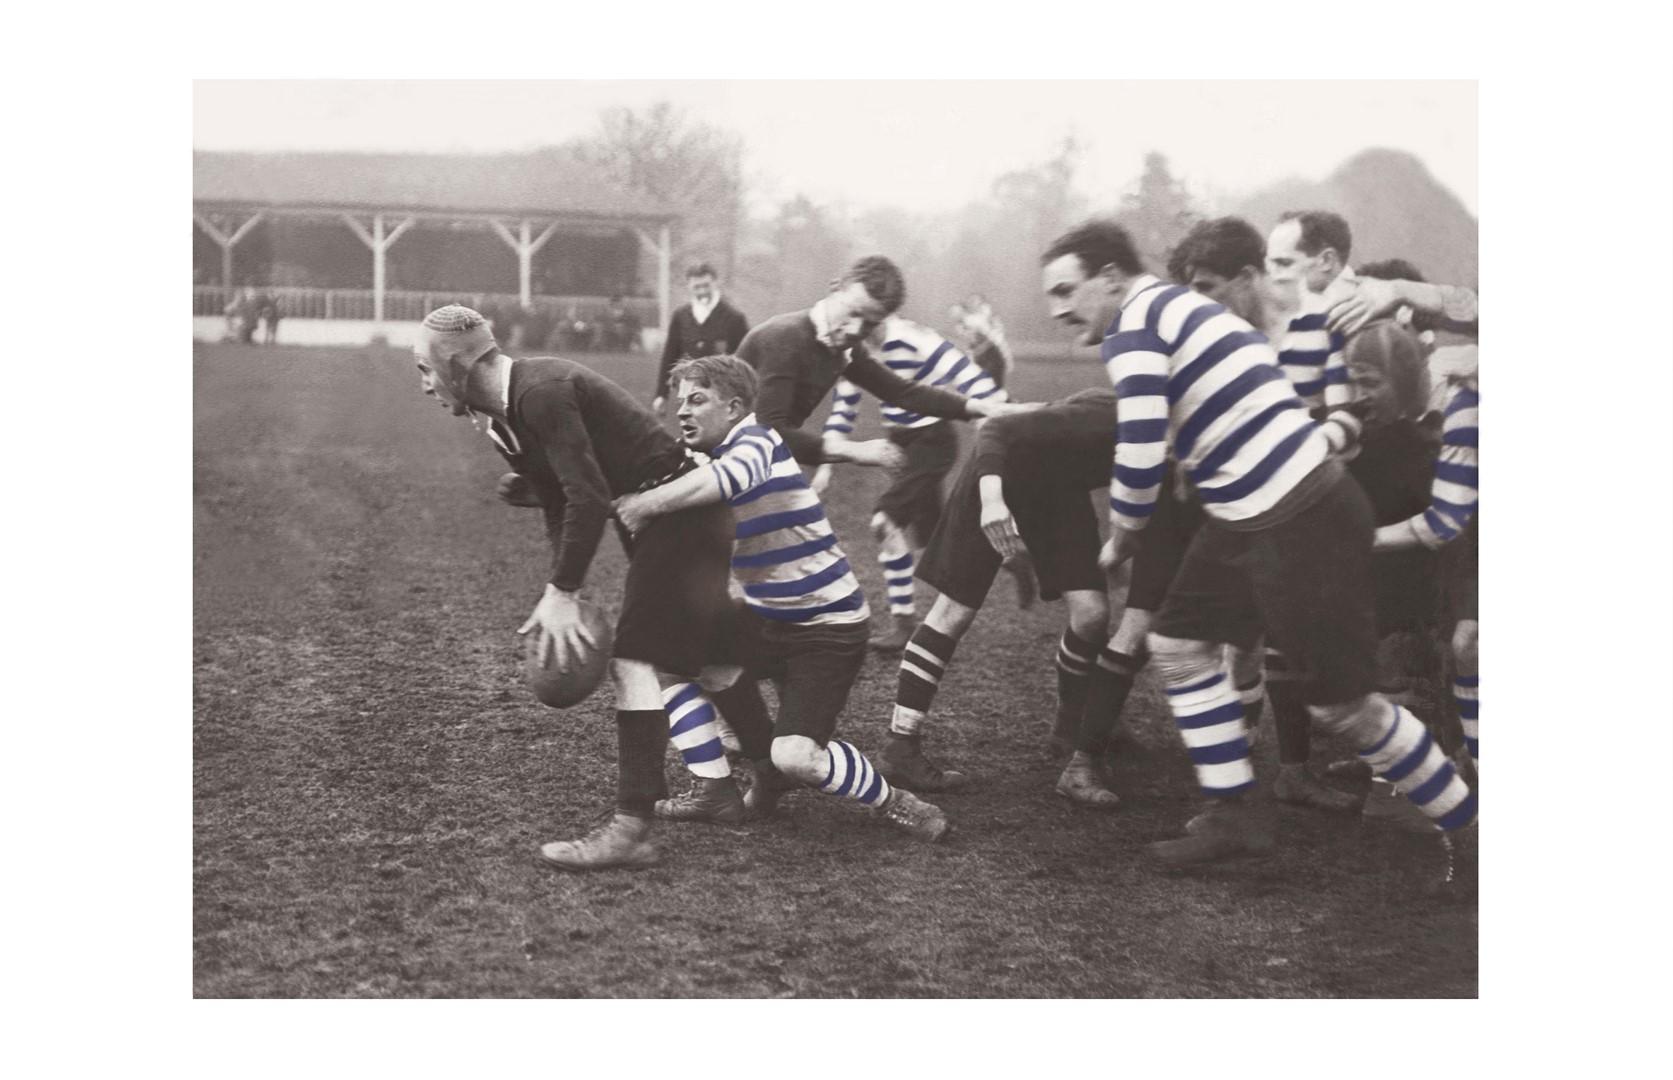 Photo ancienne couleur rugby n°07 cadre noir 40x60cm